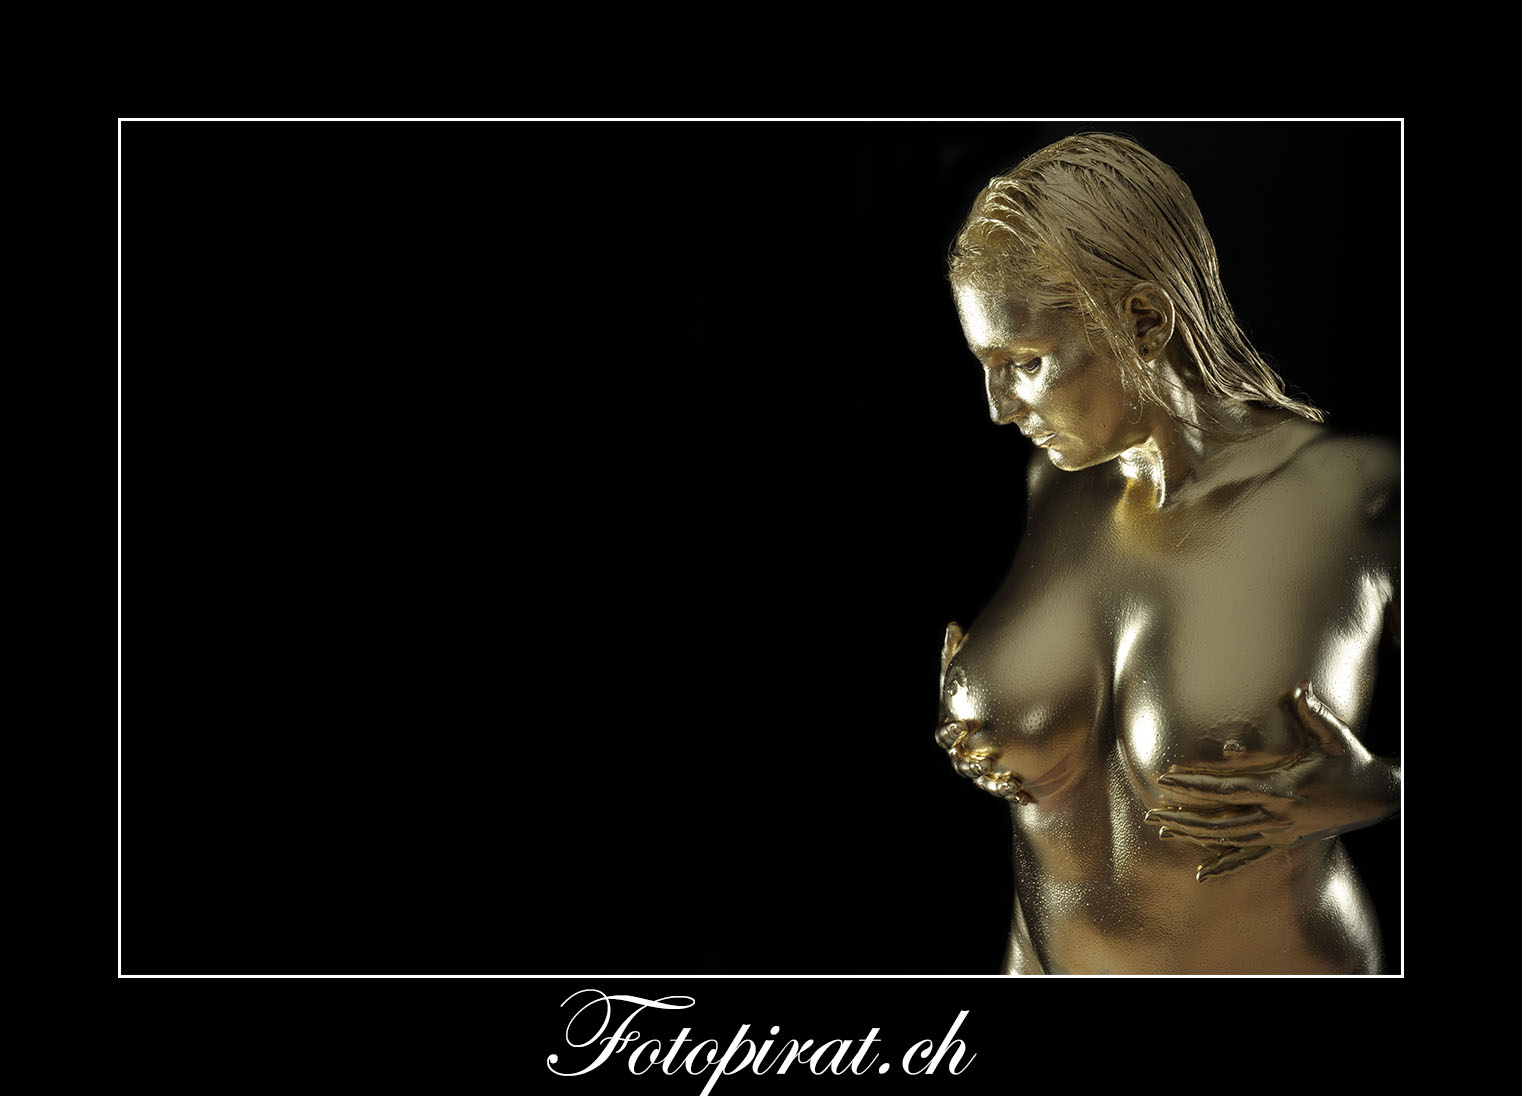 Goldshooting; Goldfinger; James Bond; Fotoshooting Zürich; Nude; Akt; Erotik; Goldfarbe; Grosse Brüste; Bodypainting; Bodypaint; Gold; Tfp Shooting; Gratis Fotoshooting